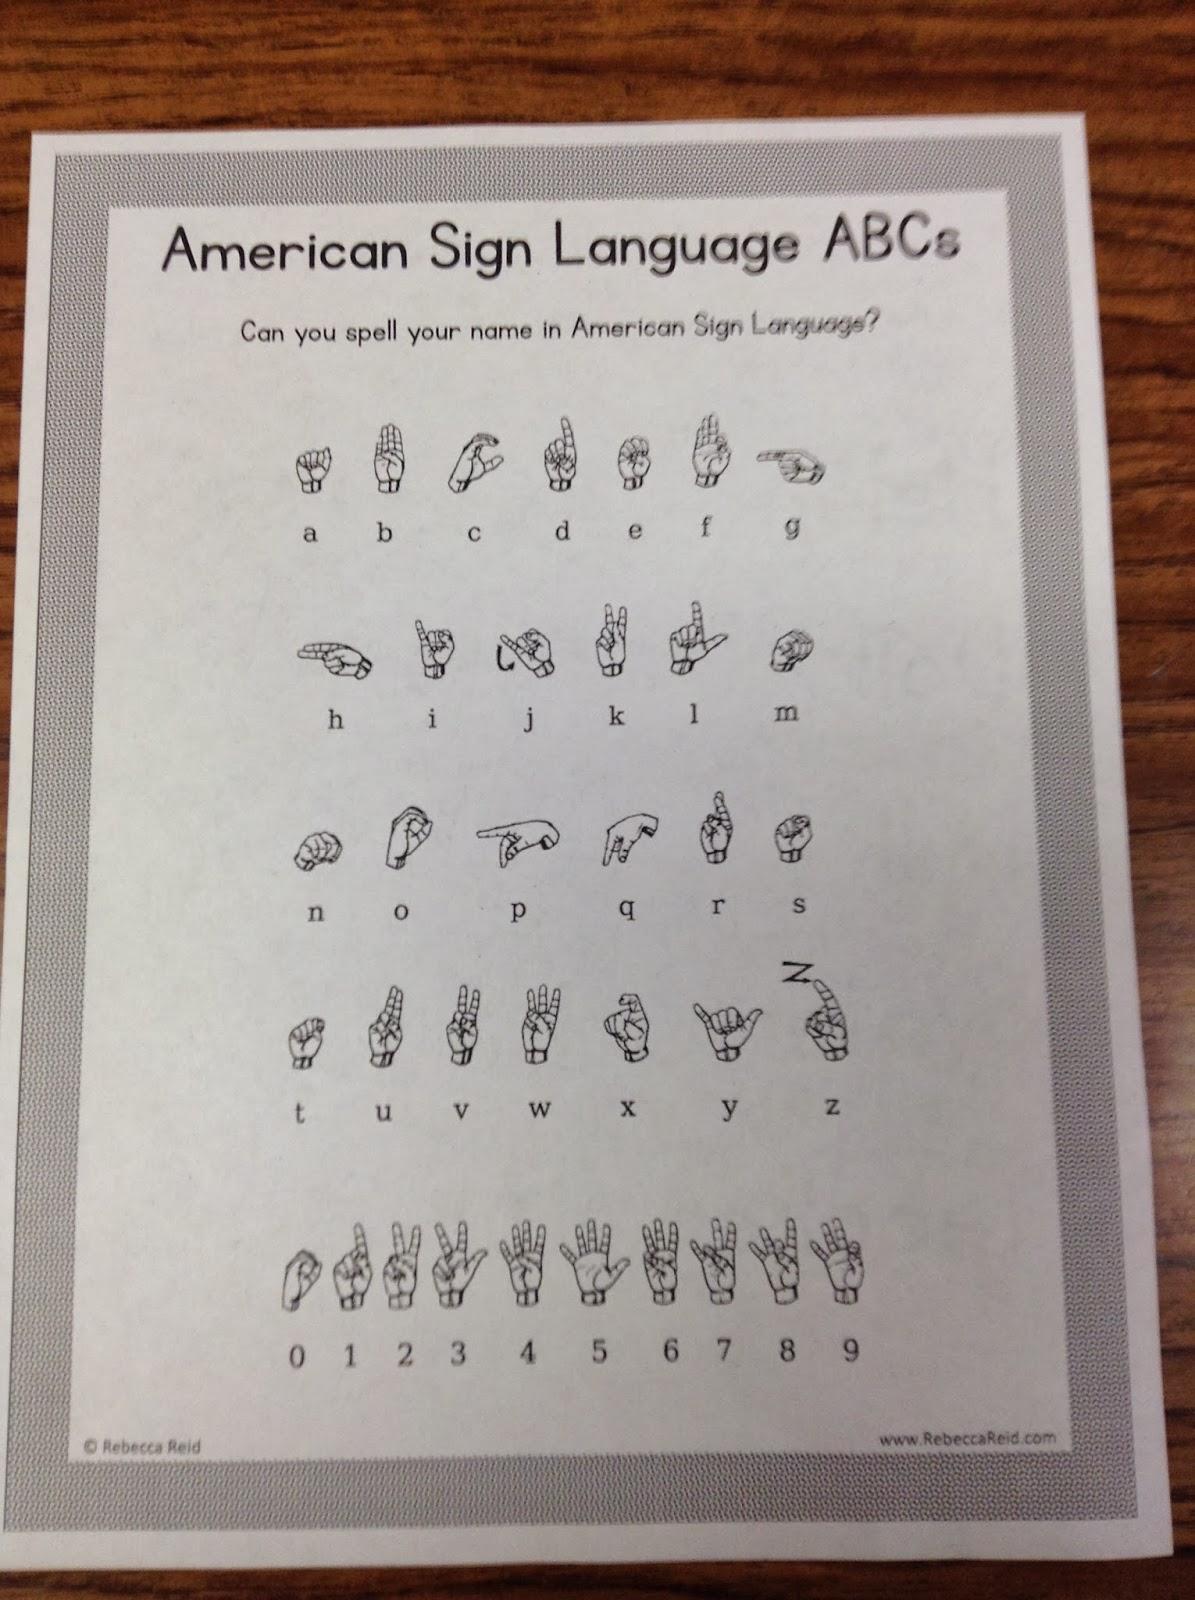 Mrs Patten Helen Keller Use Of Sign Language